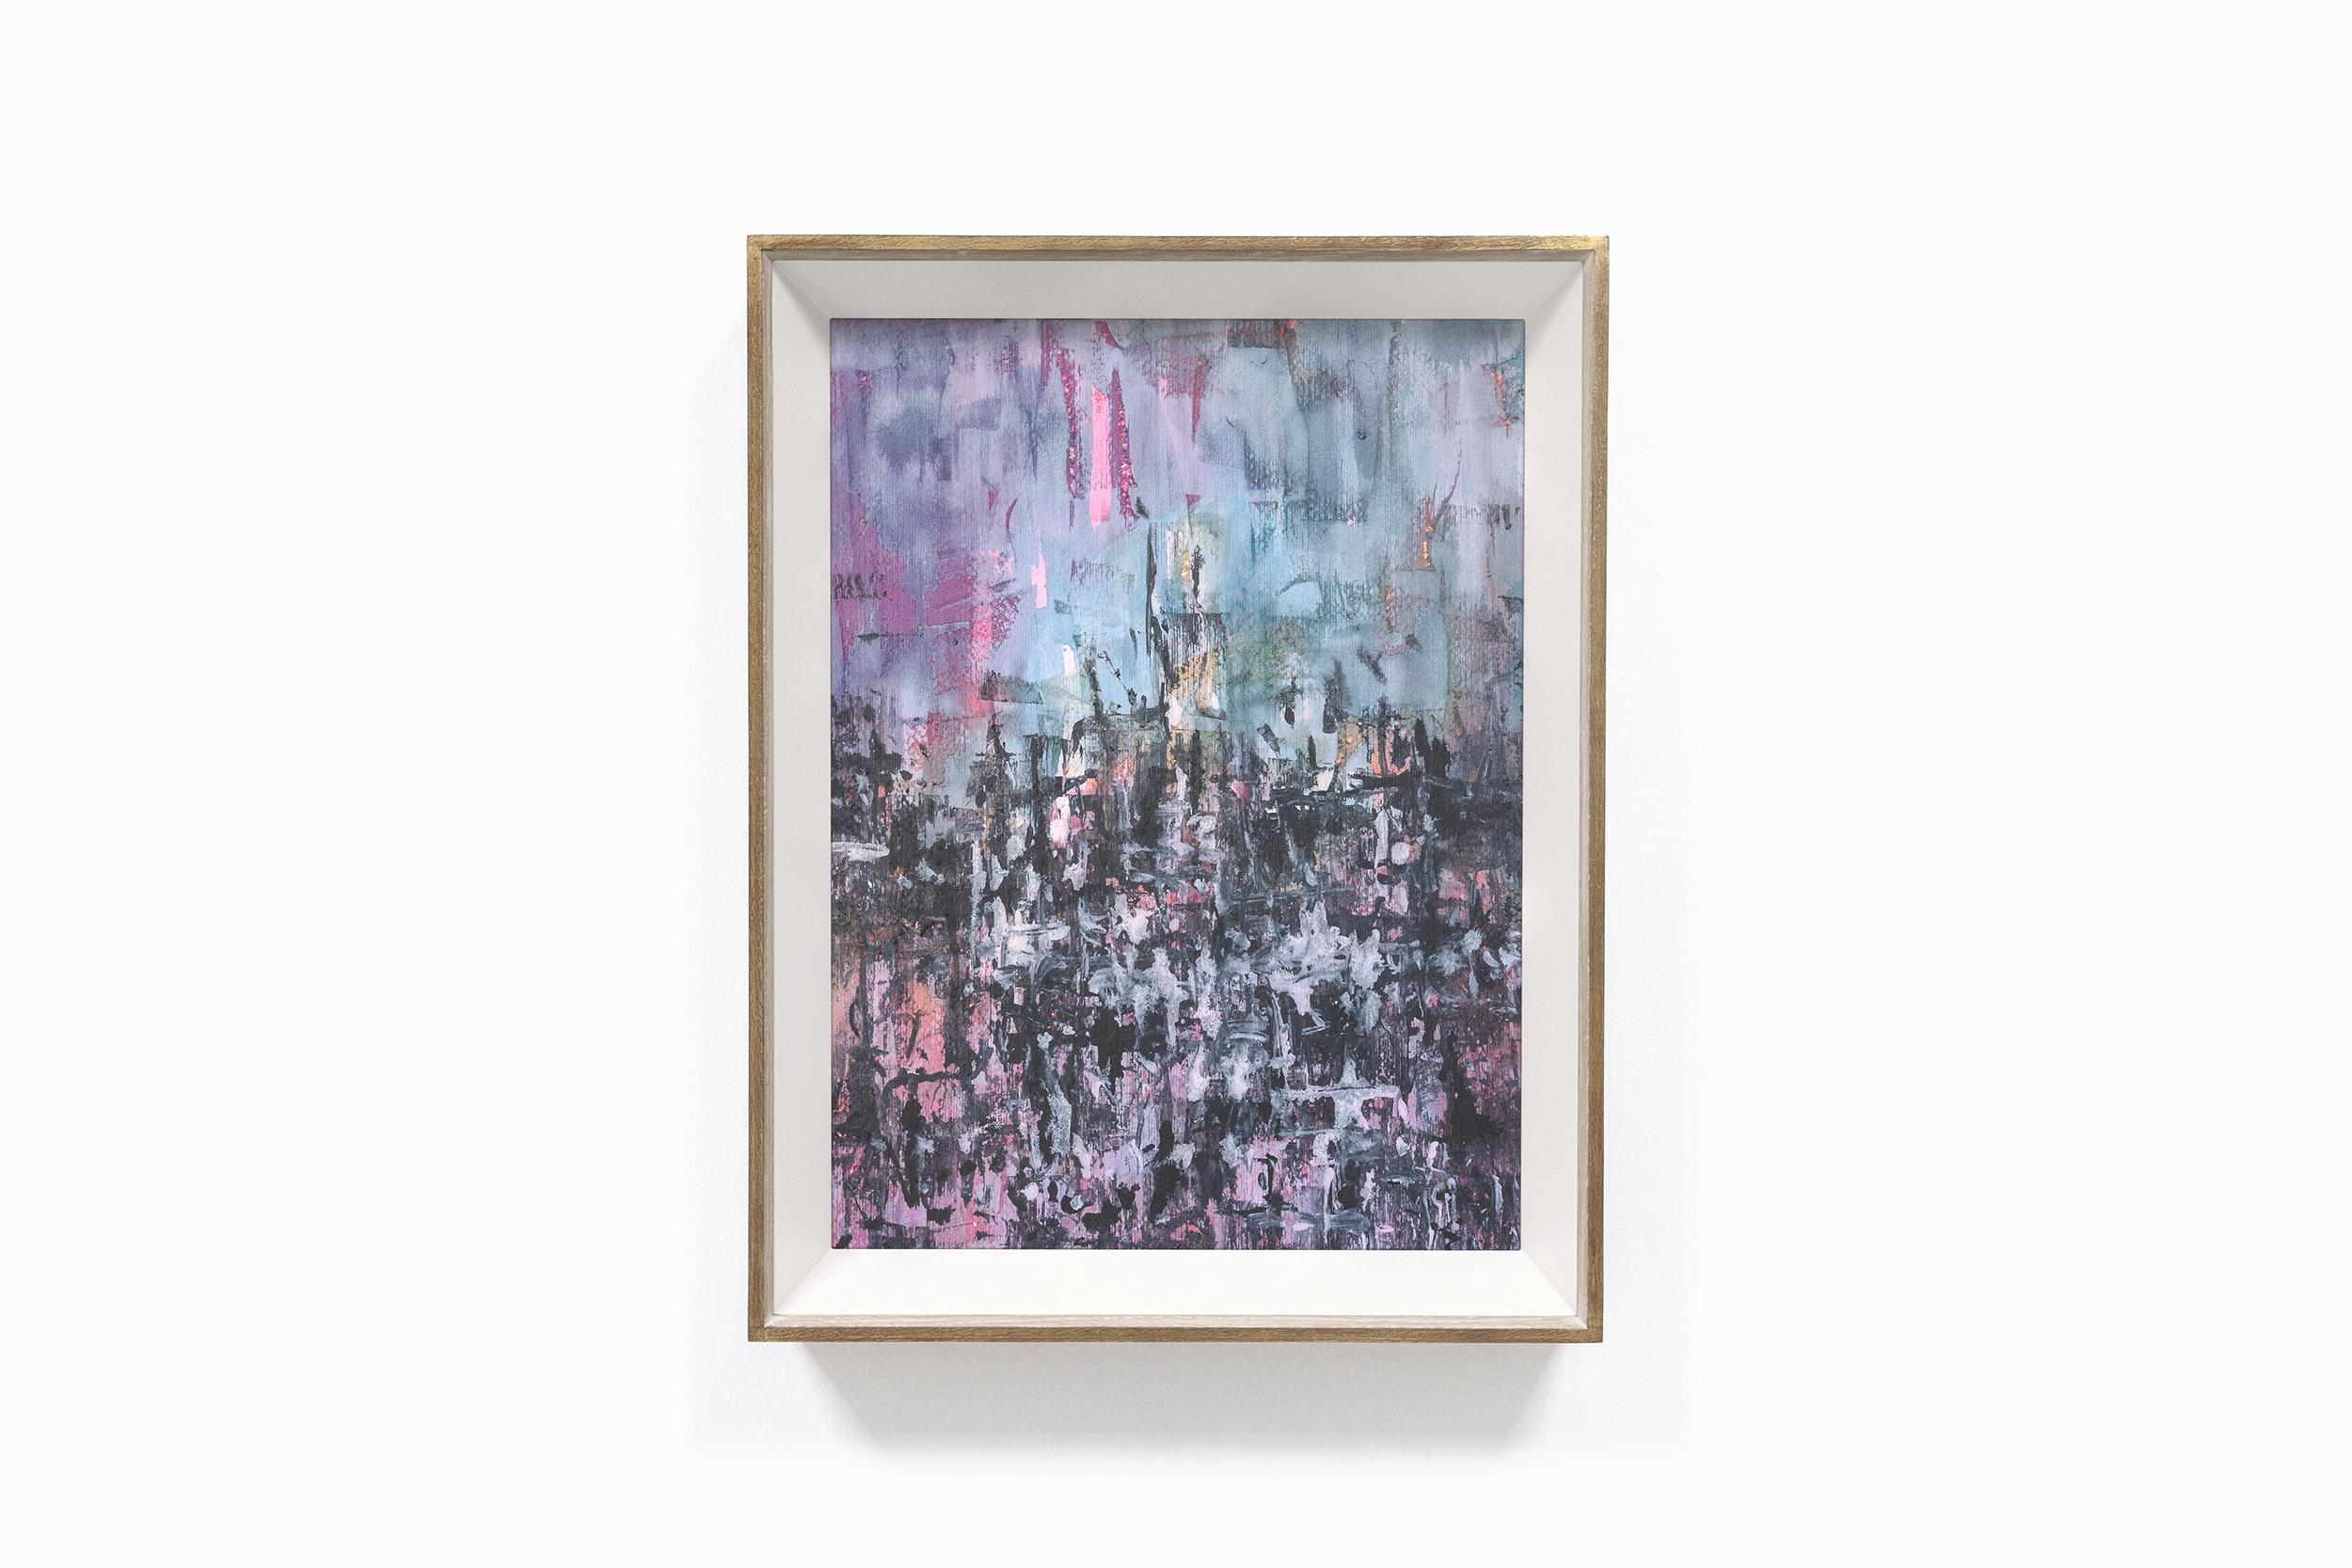 bonjourmolotov+Faded+cities+Illustration+Ilustracao+painting+pintura+acrylic+acrílico+canvas+tela+paper+cardboard+mdf+Andre+Gigante+06N5C.jpg